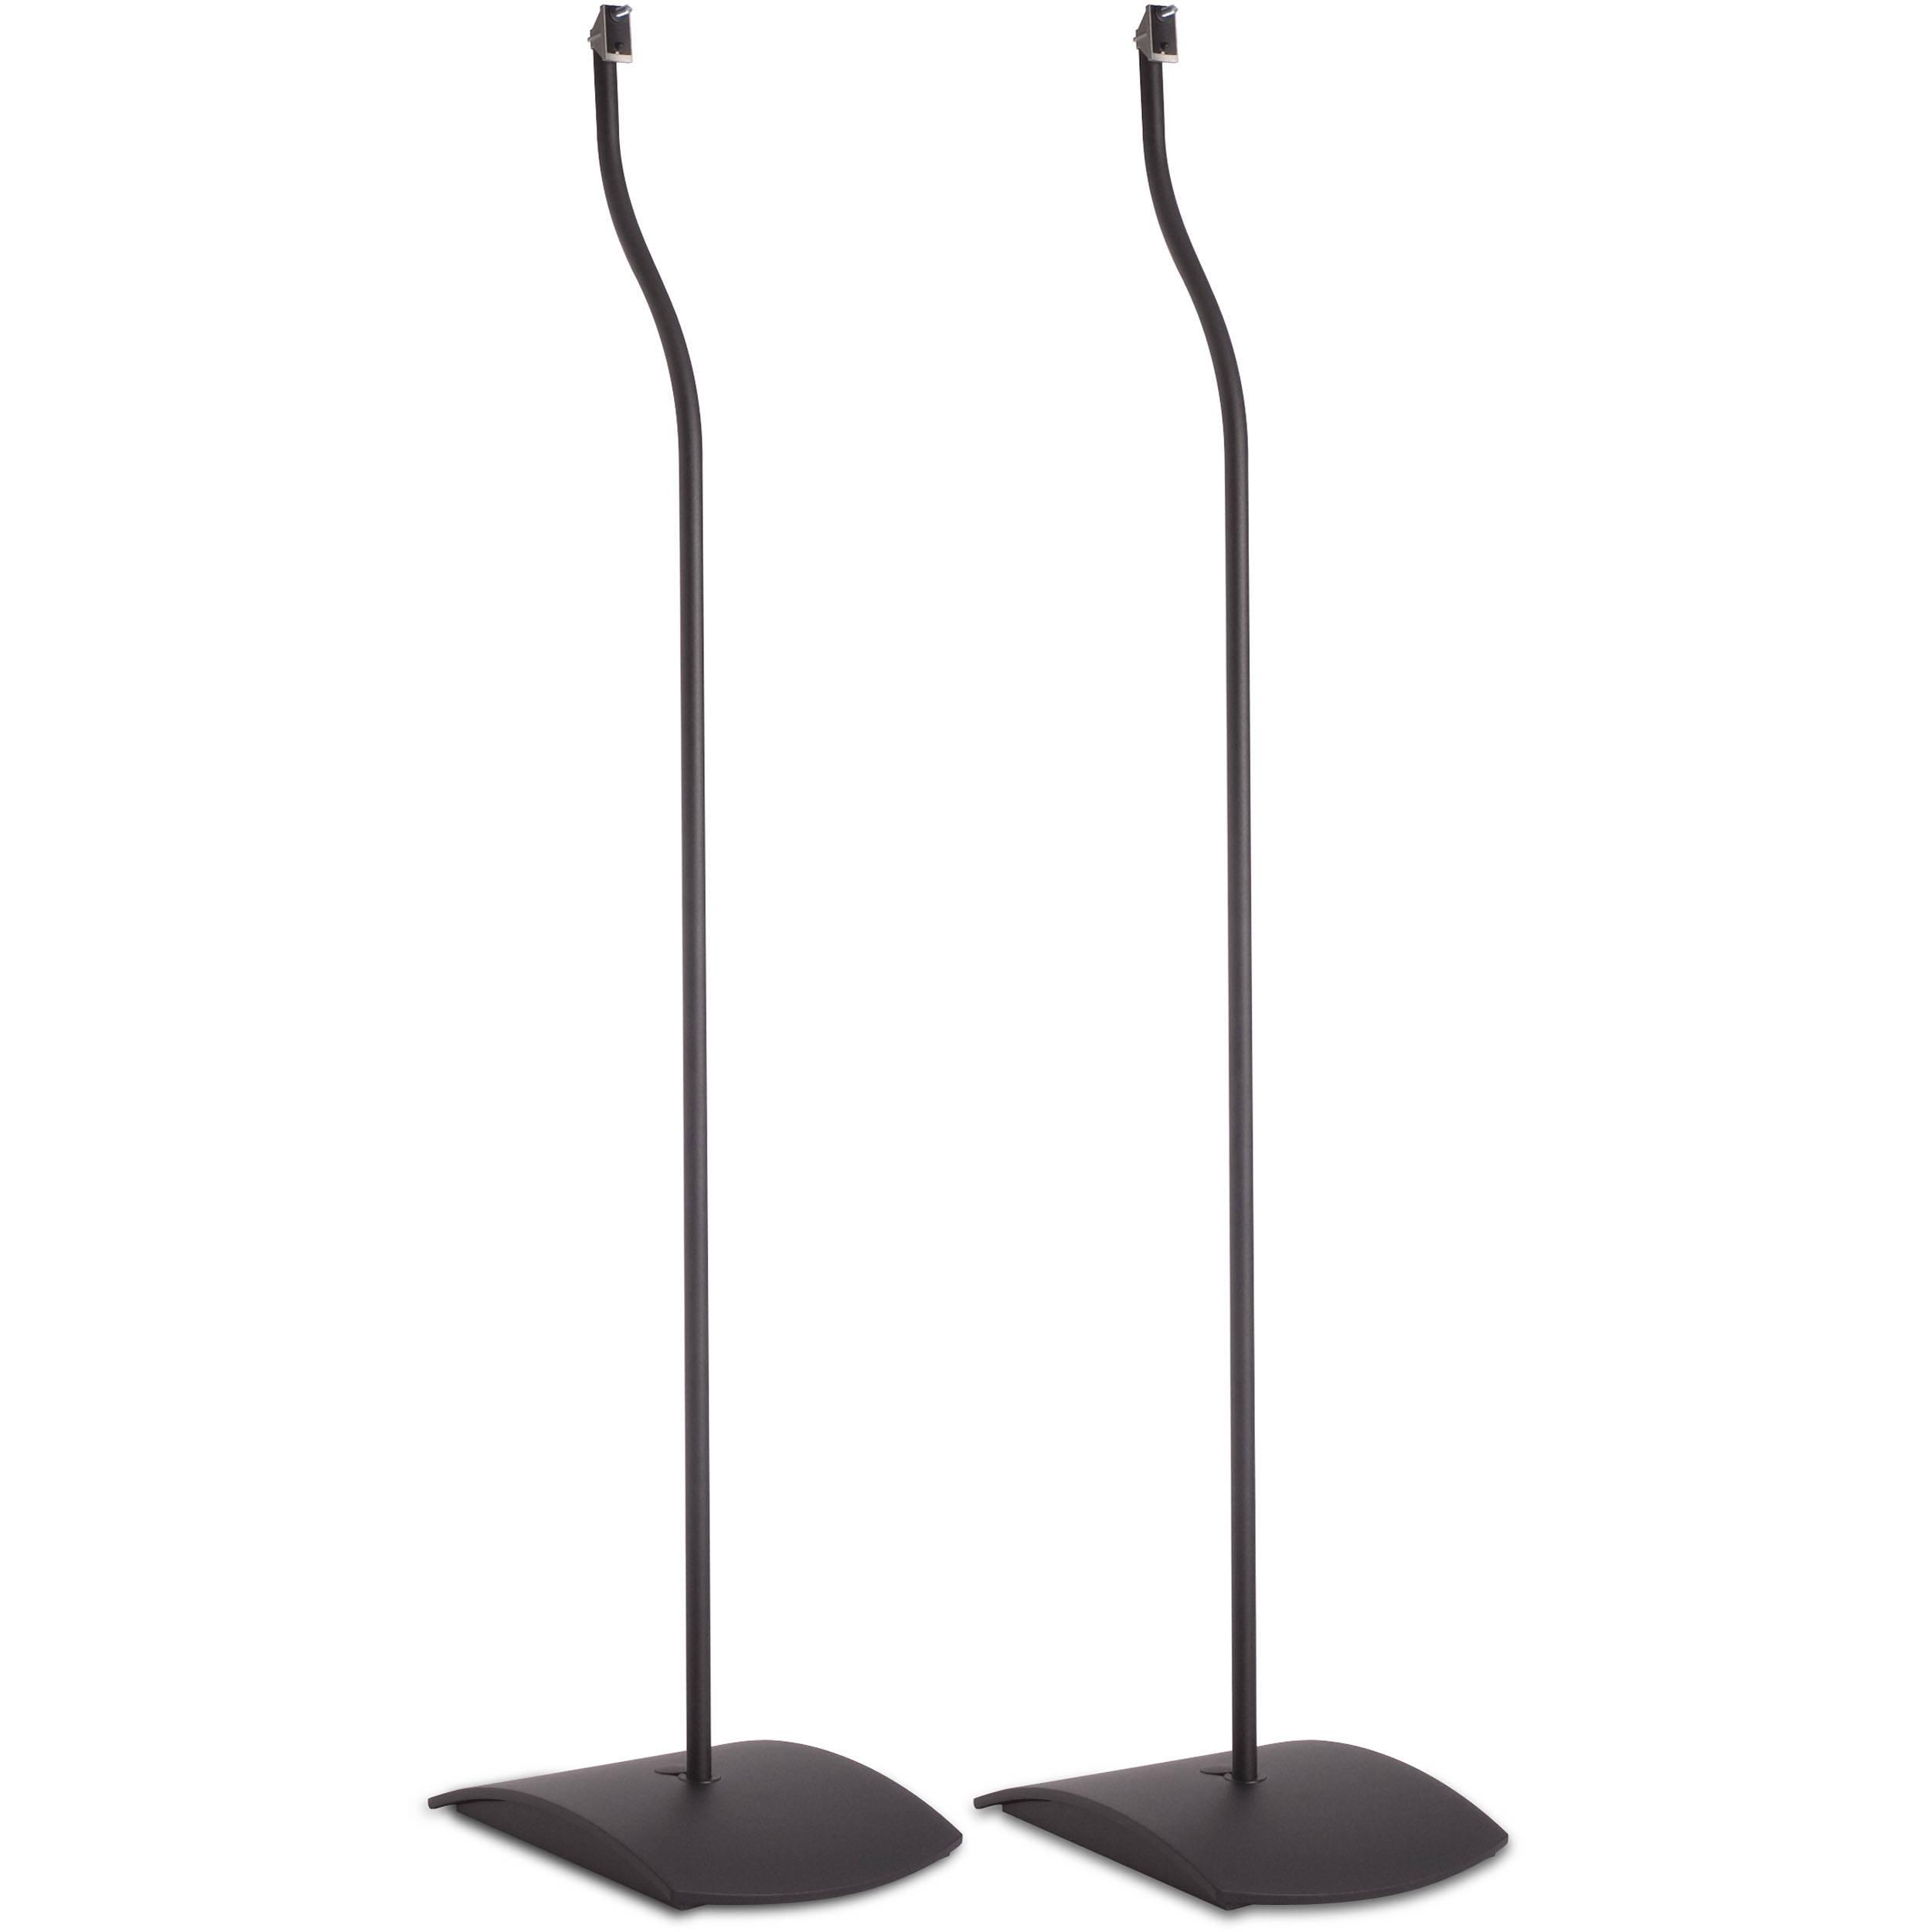 bose ufs 20 universal floor stands black 17628 b h photo video rh bhphotovideo com Bose Outdoor Speakers Bose Bluetooth Speakers Sale